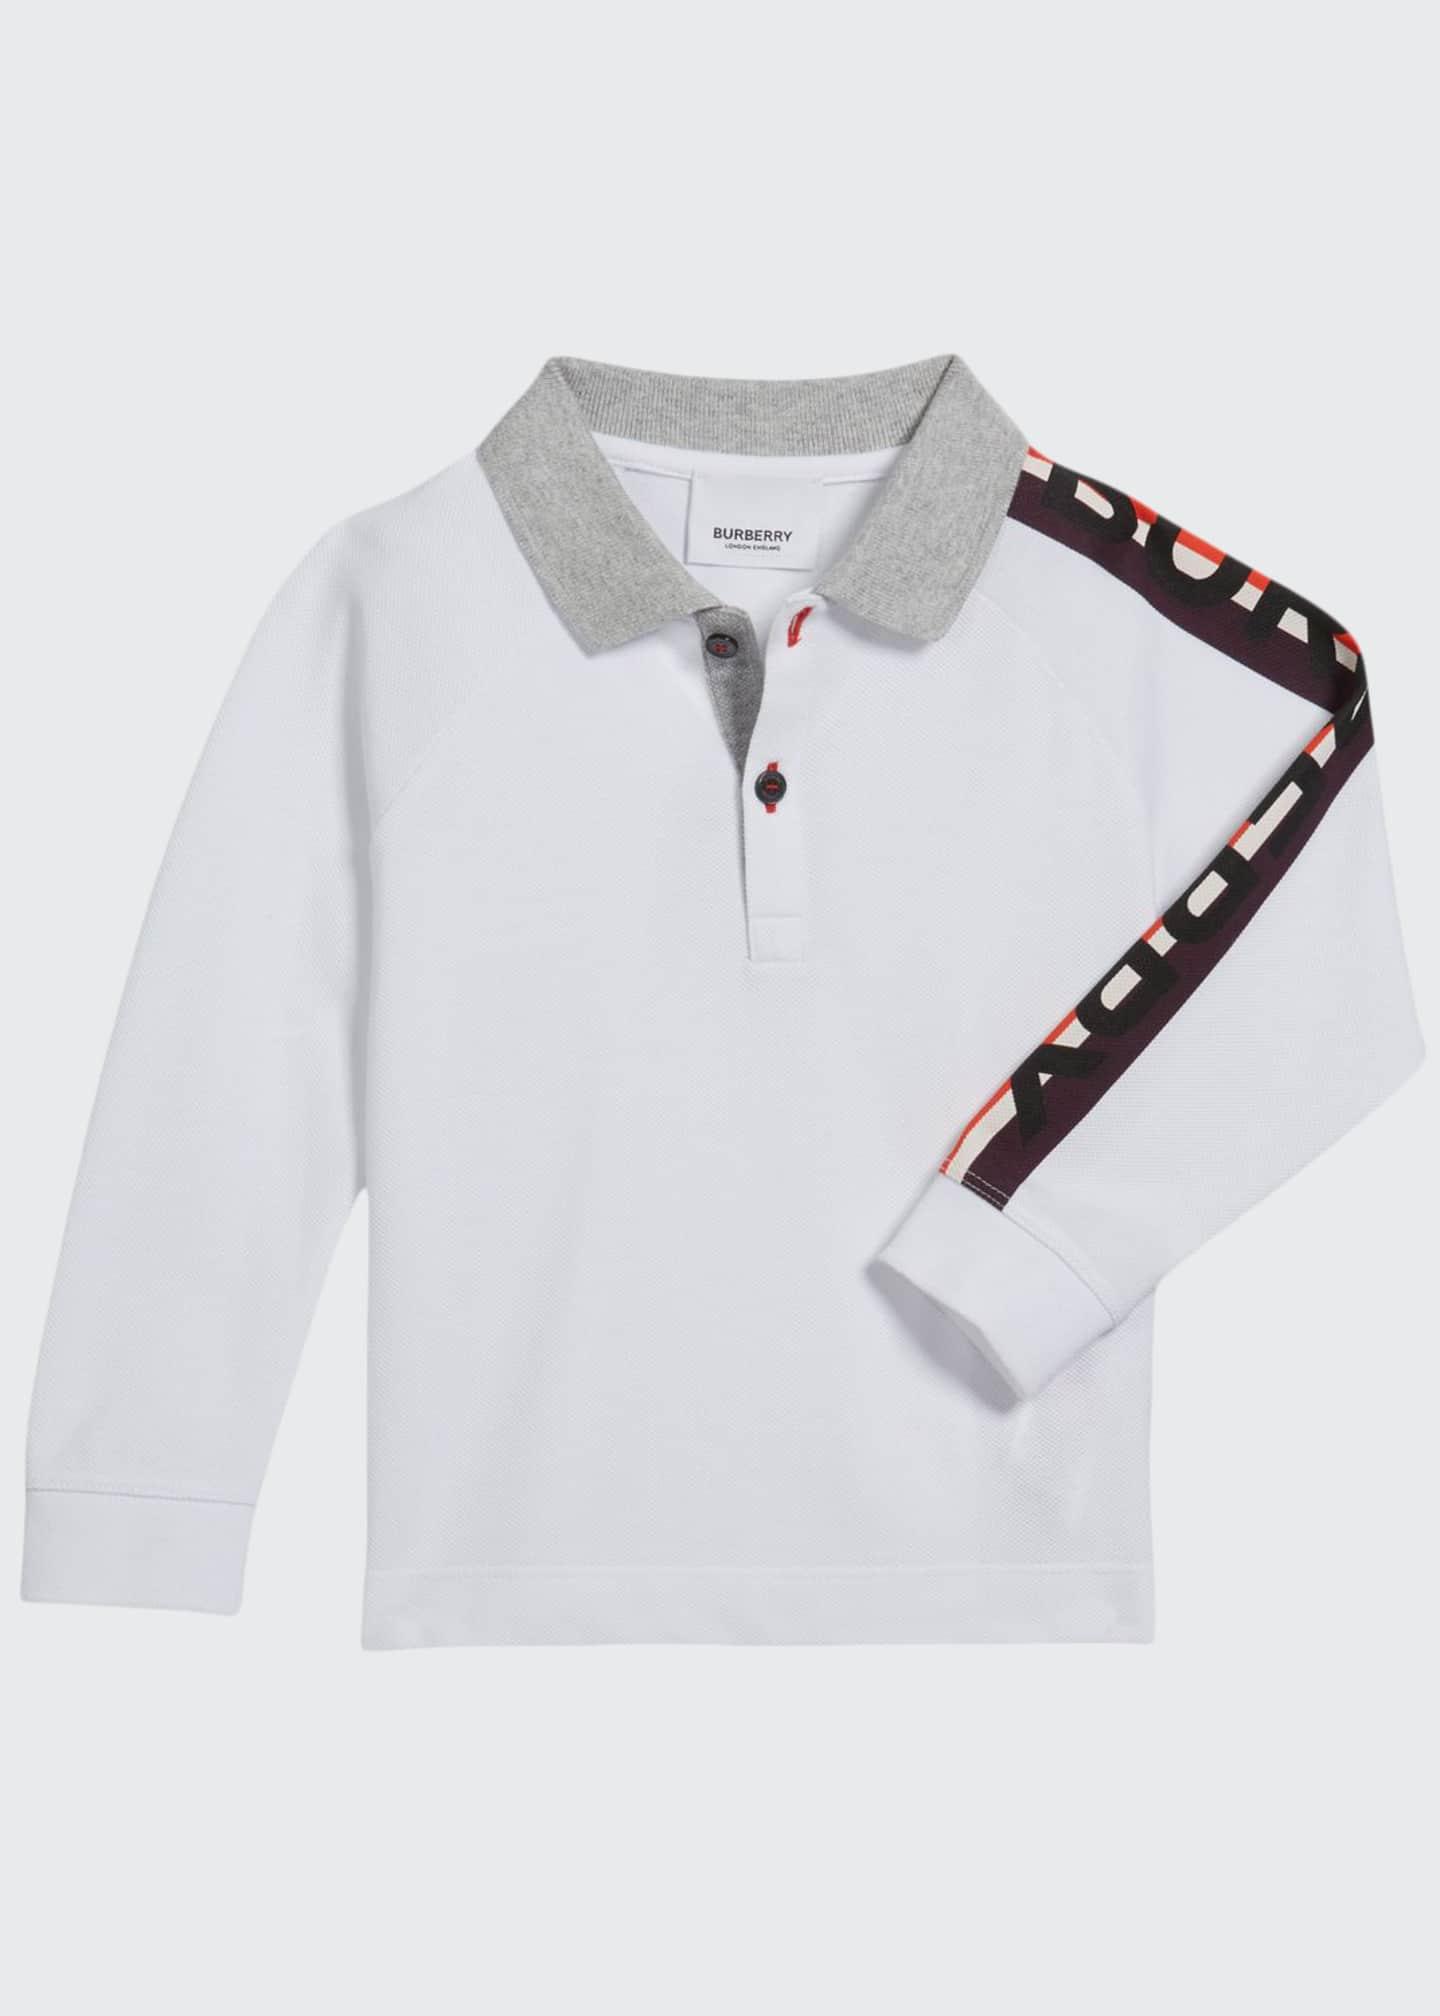 Burberry Boy's Duncan Polo Shirt w/ Logo Down